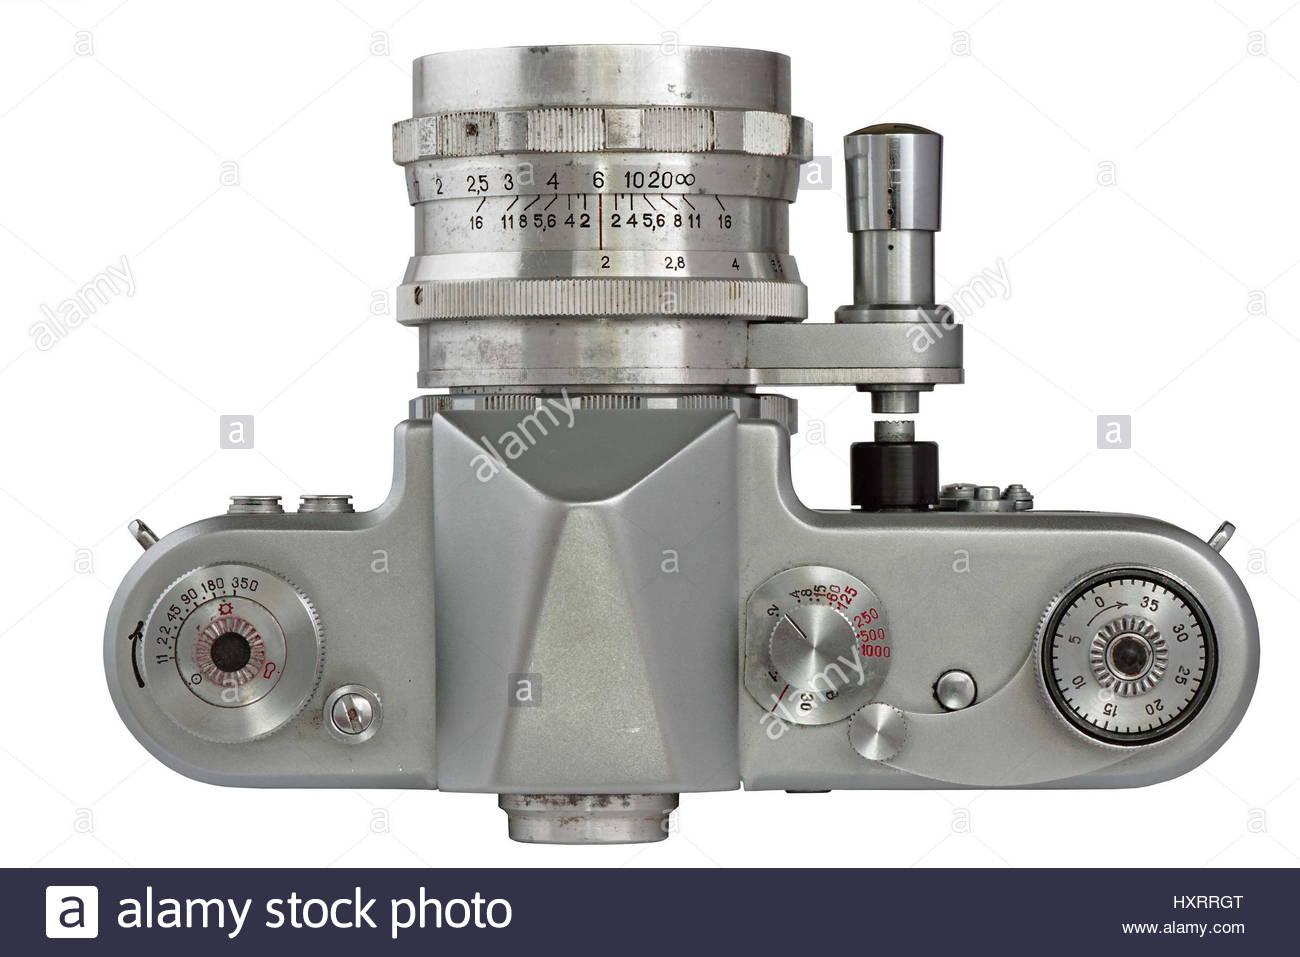 Soviet 35 mm Film SLR Photo Camera with automated diaphragm option (1950's) - Stock Image